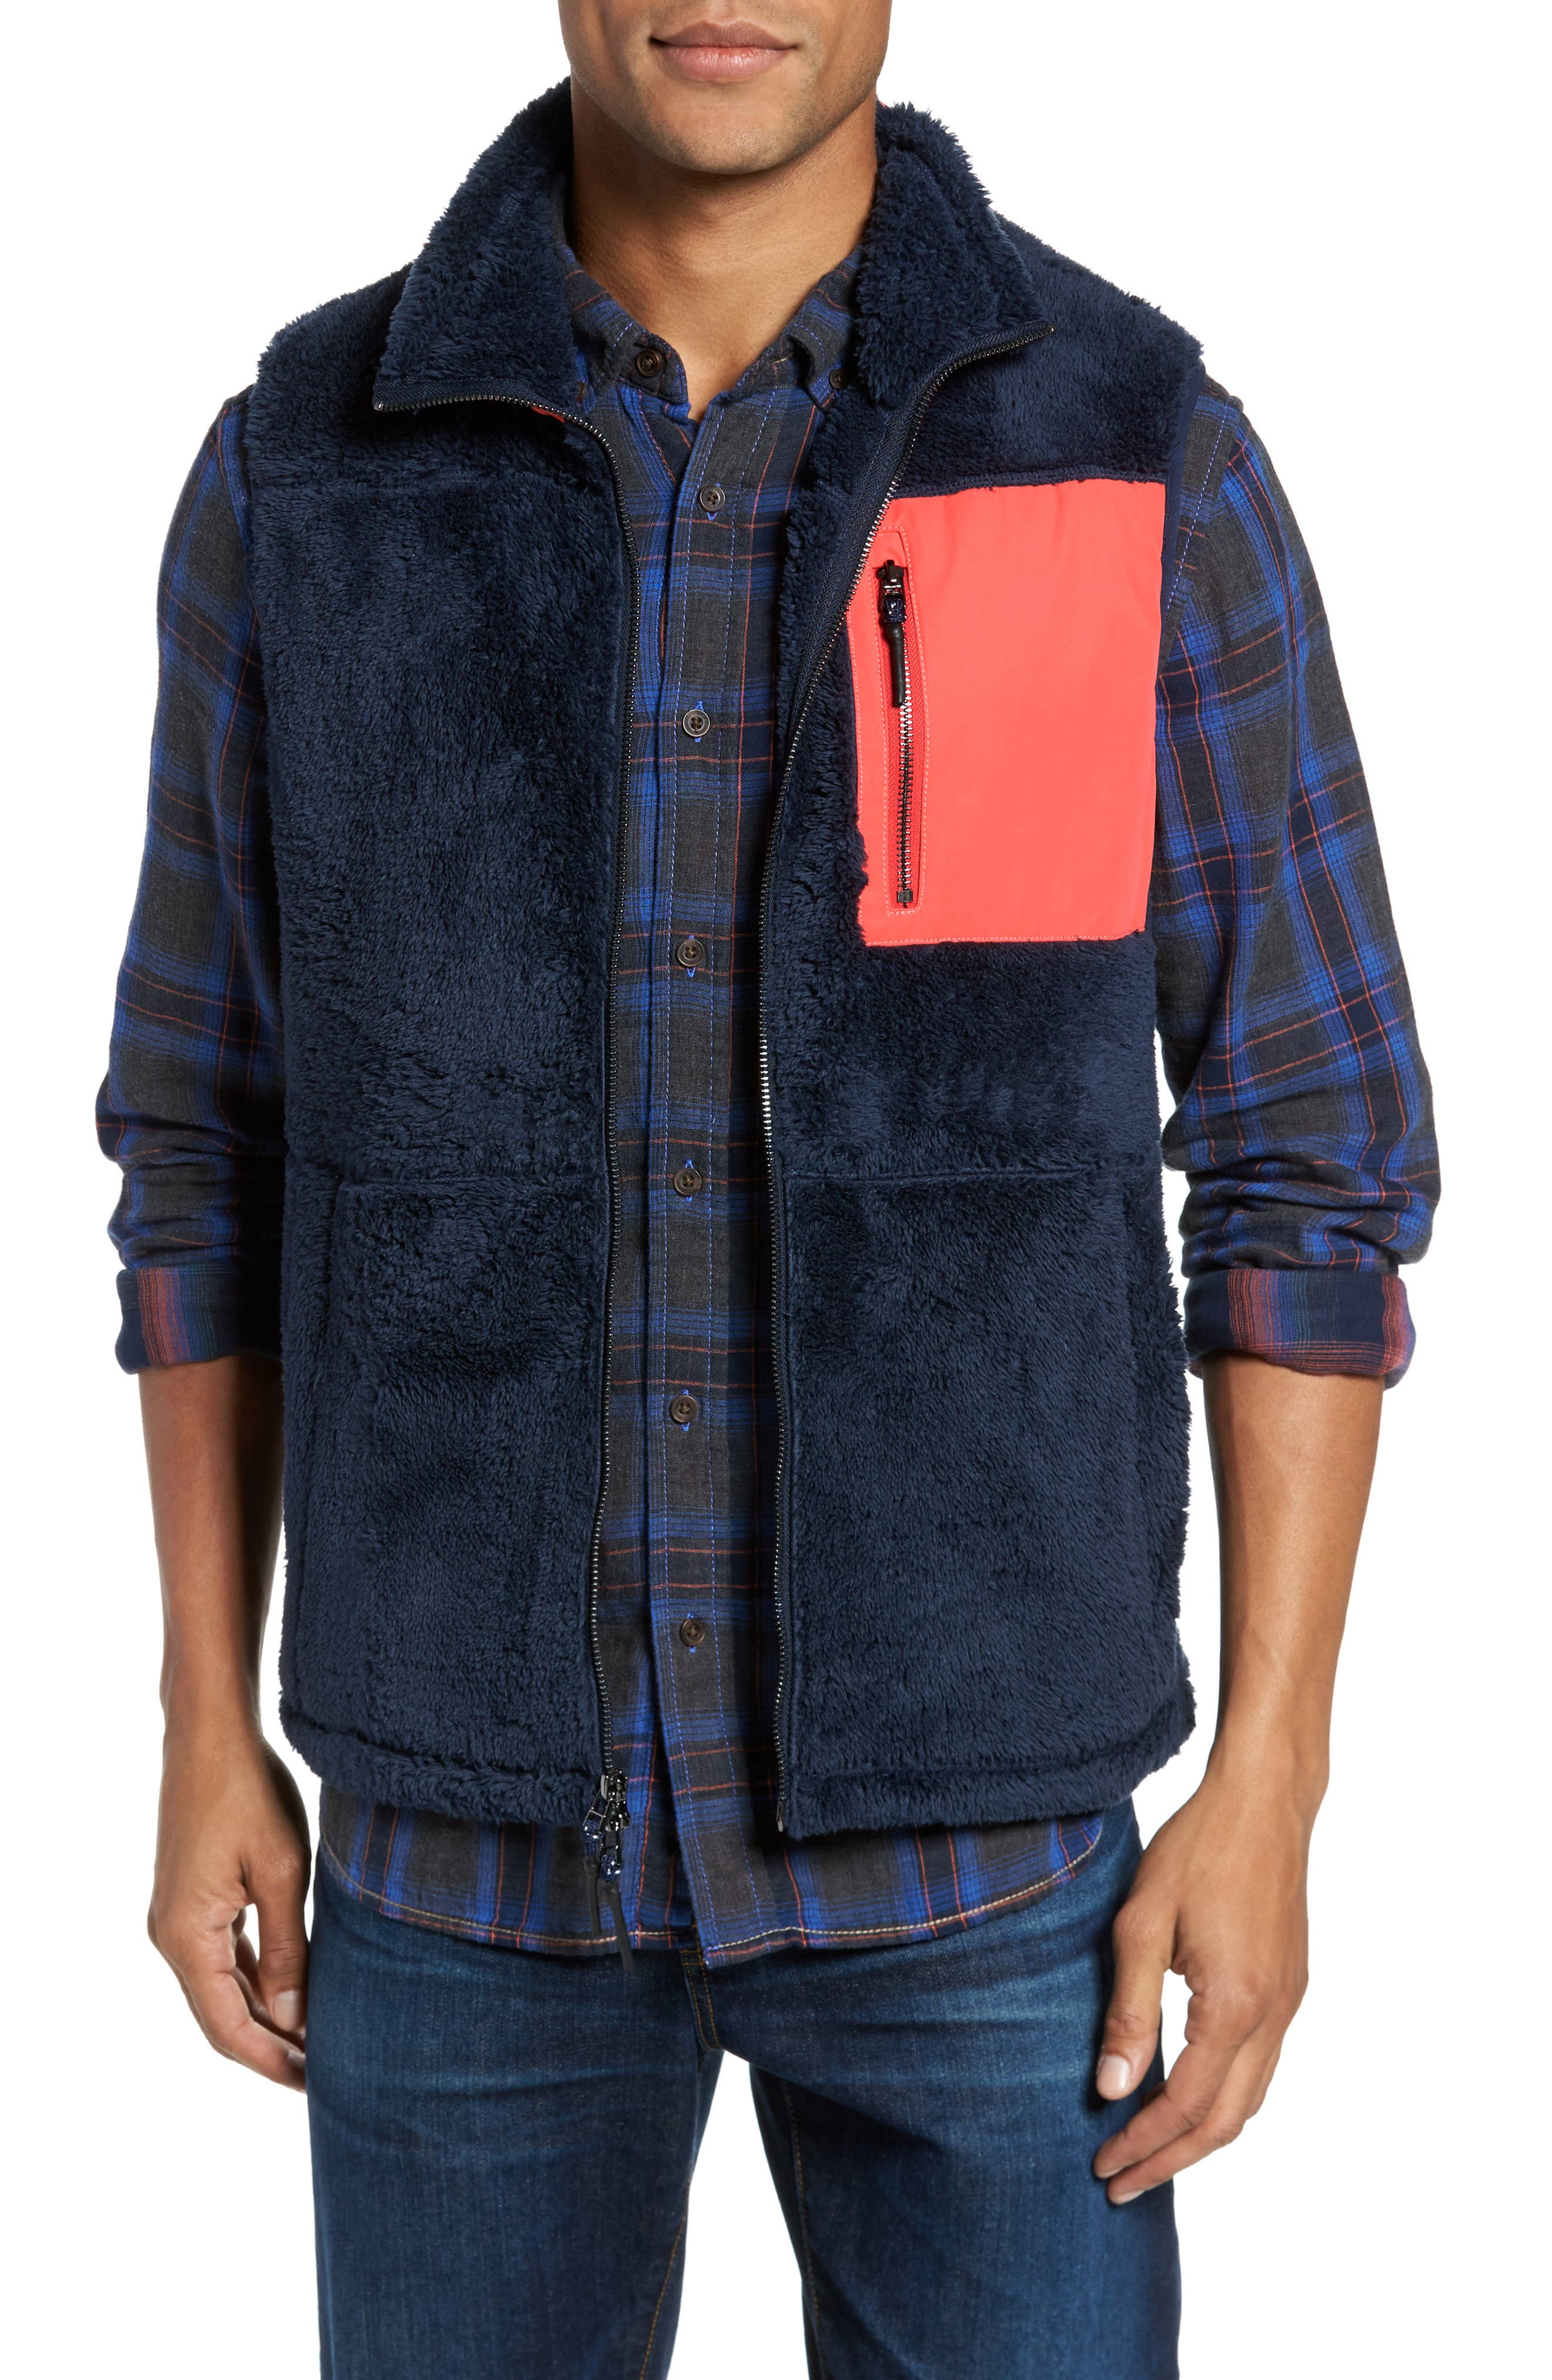 Main Image - Surfside Supply Colorblock Fleece Vest